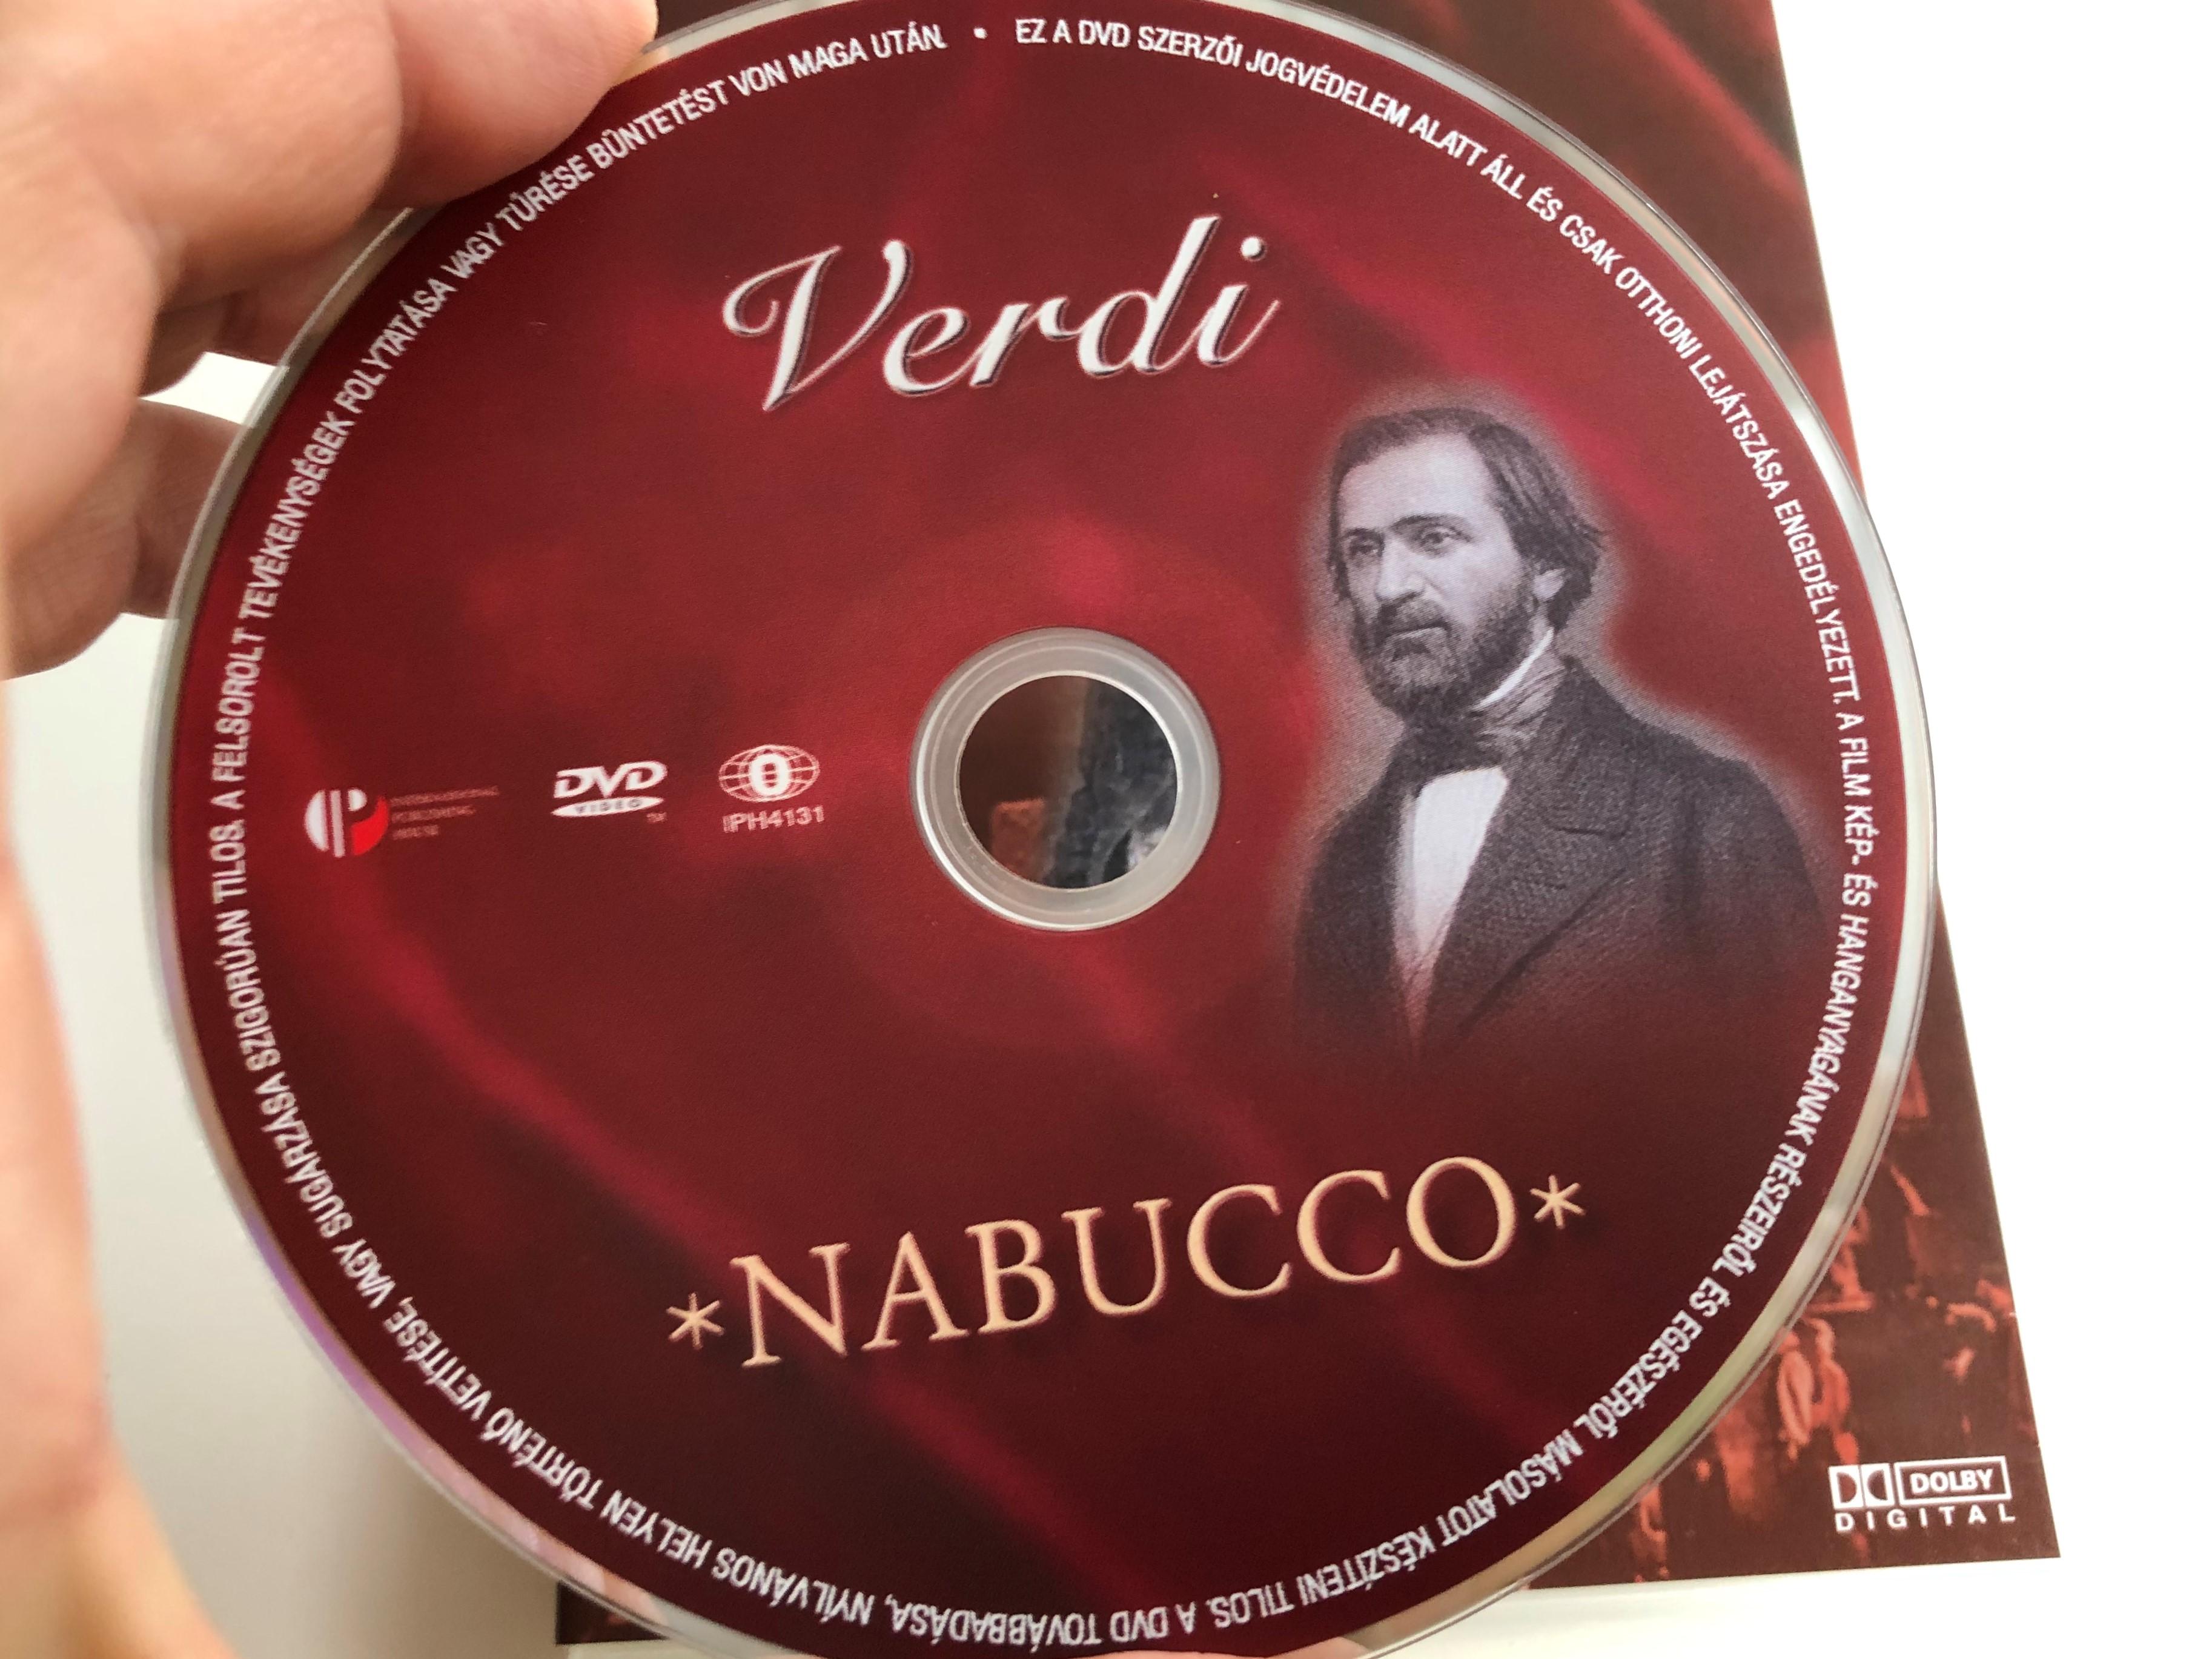 verdi-nabucco-dvd-2000-opera-in-4-acts-2.jpg